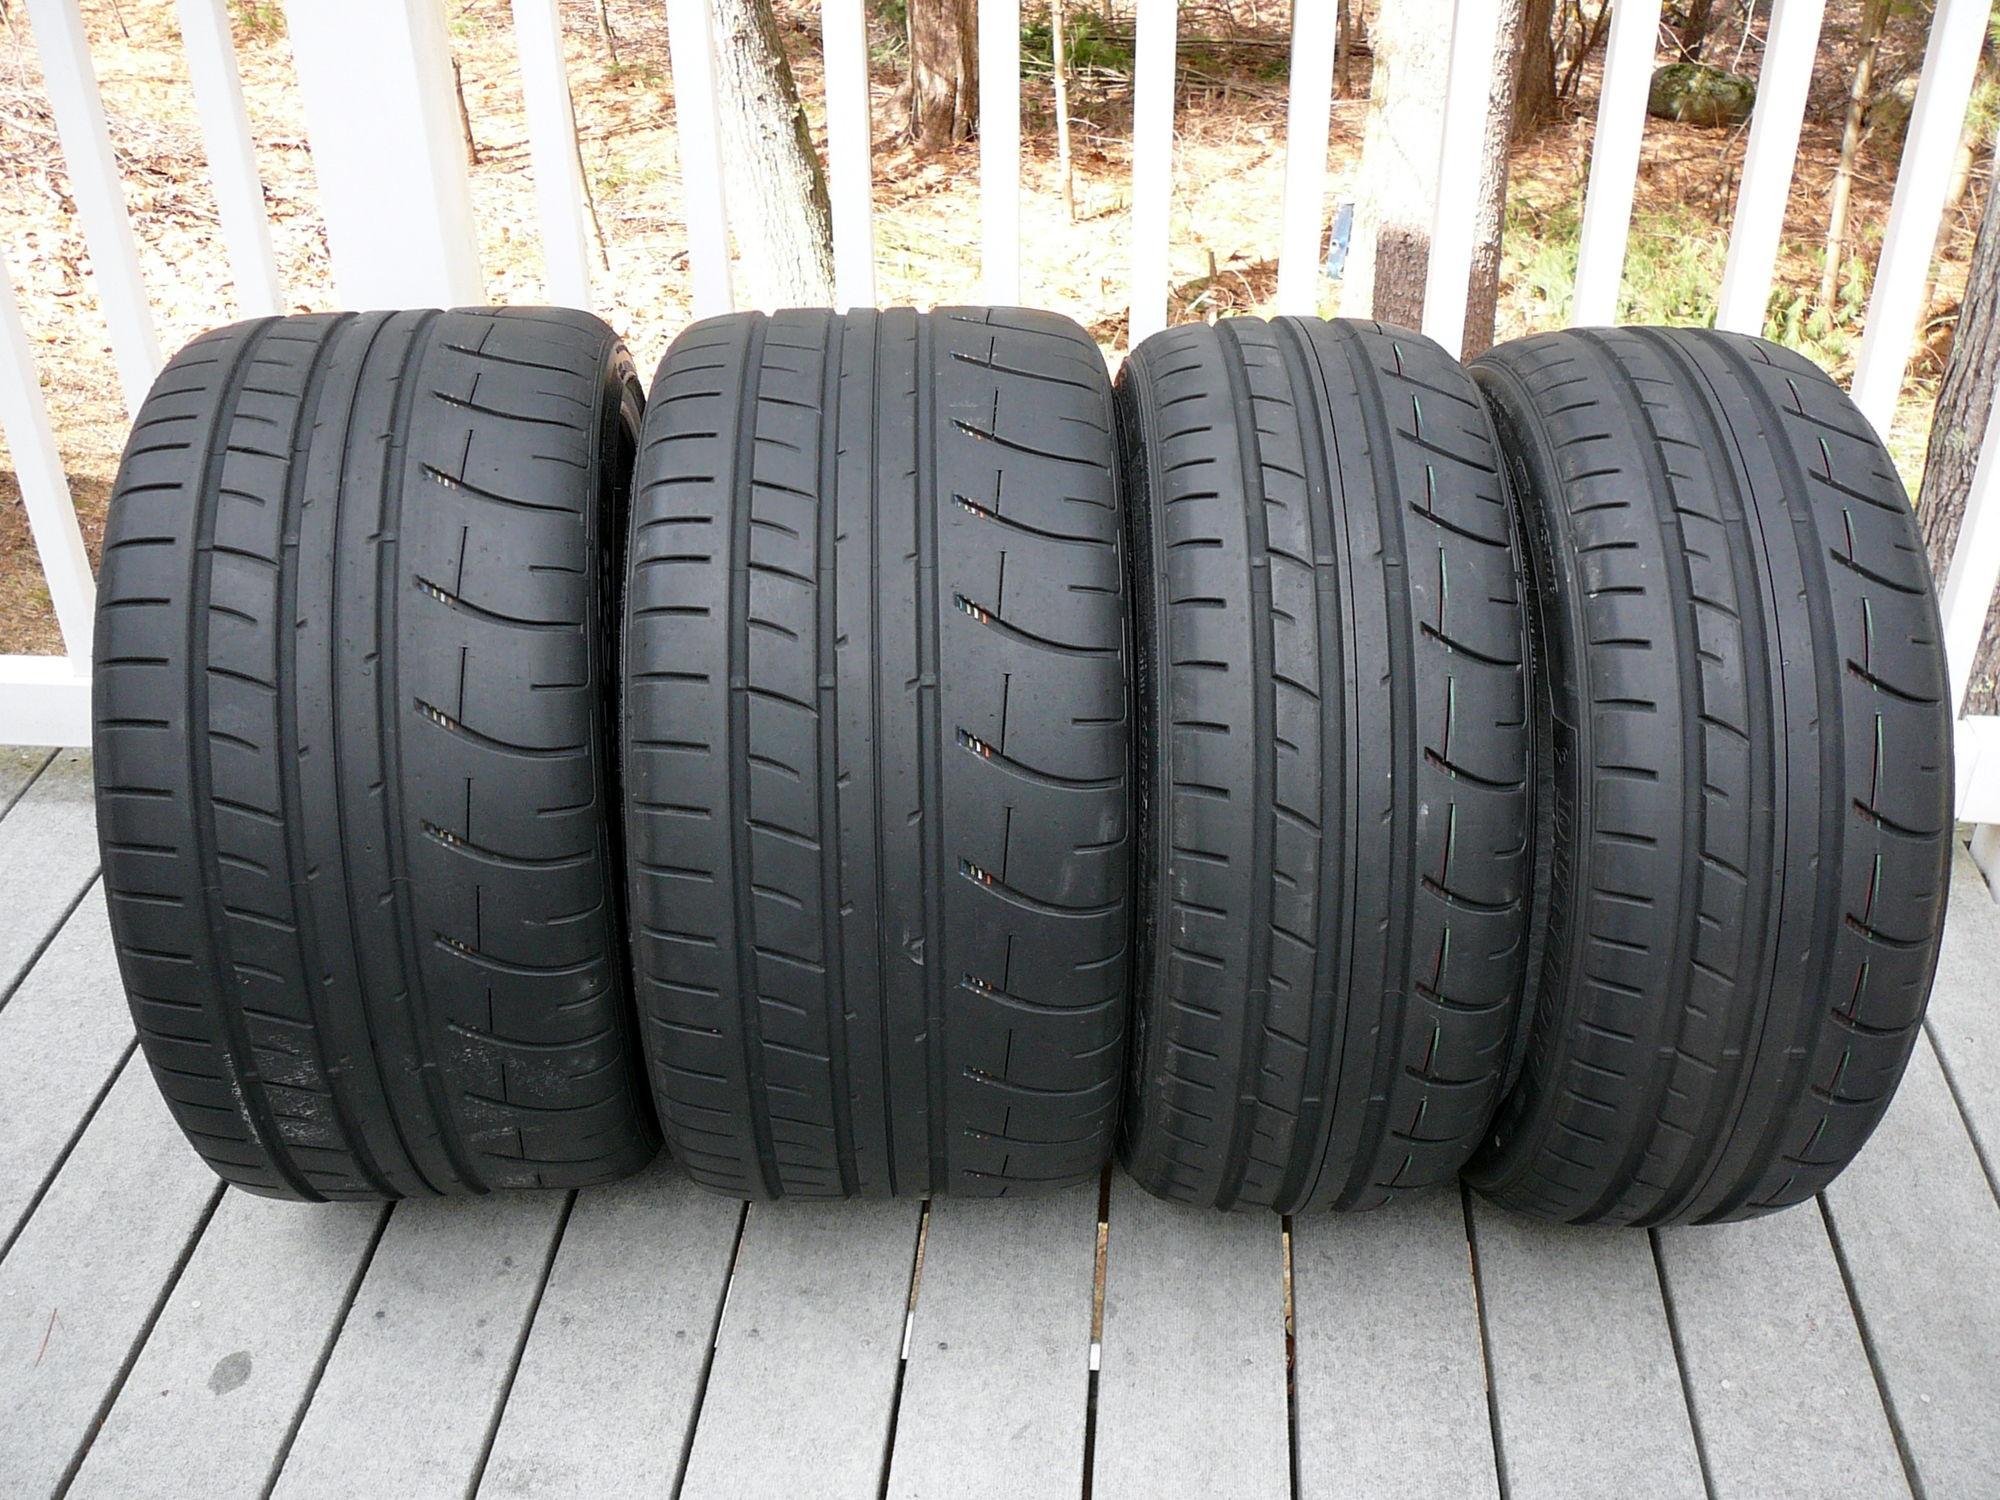 fs dunlop sport maxx race tires 2 305 30 zr20 2 245. Black Bedroom Furniture Sets. Home Design Ideas